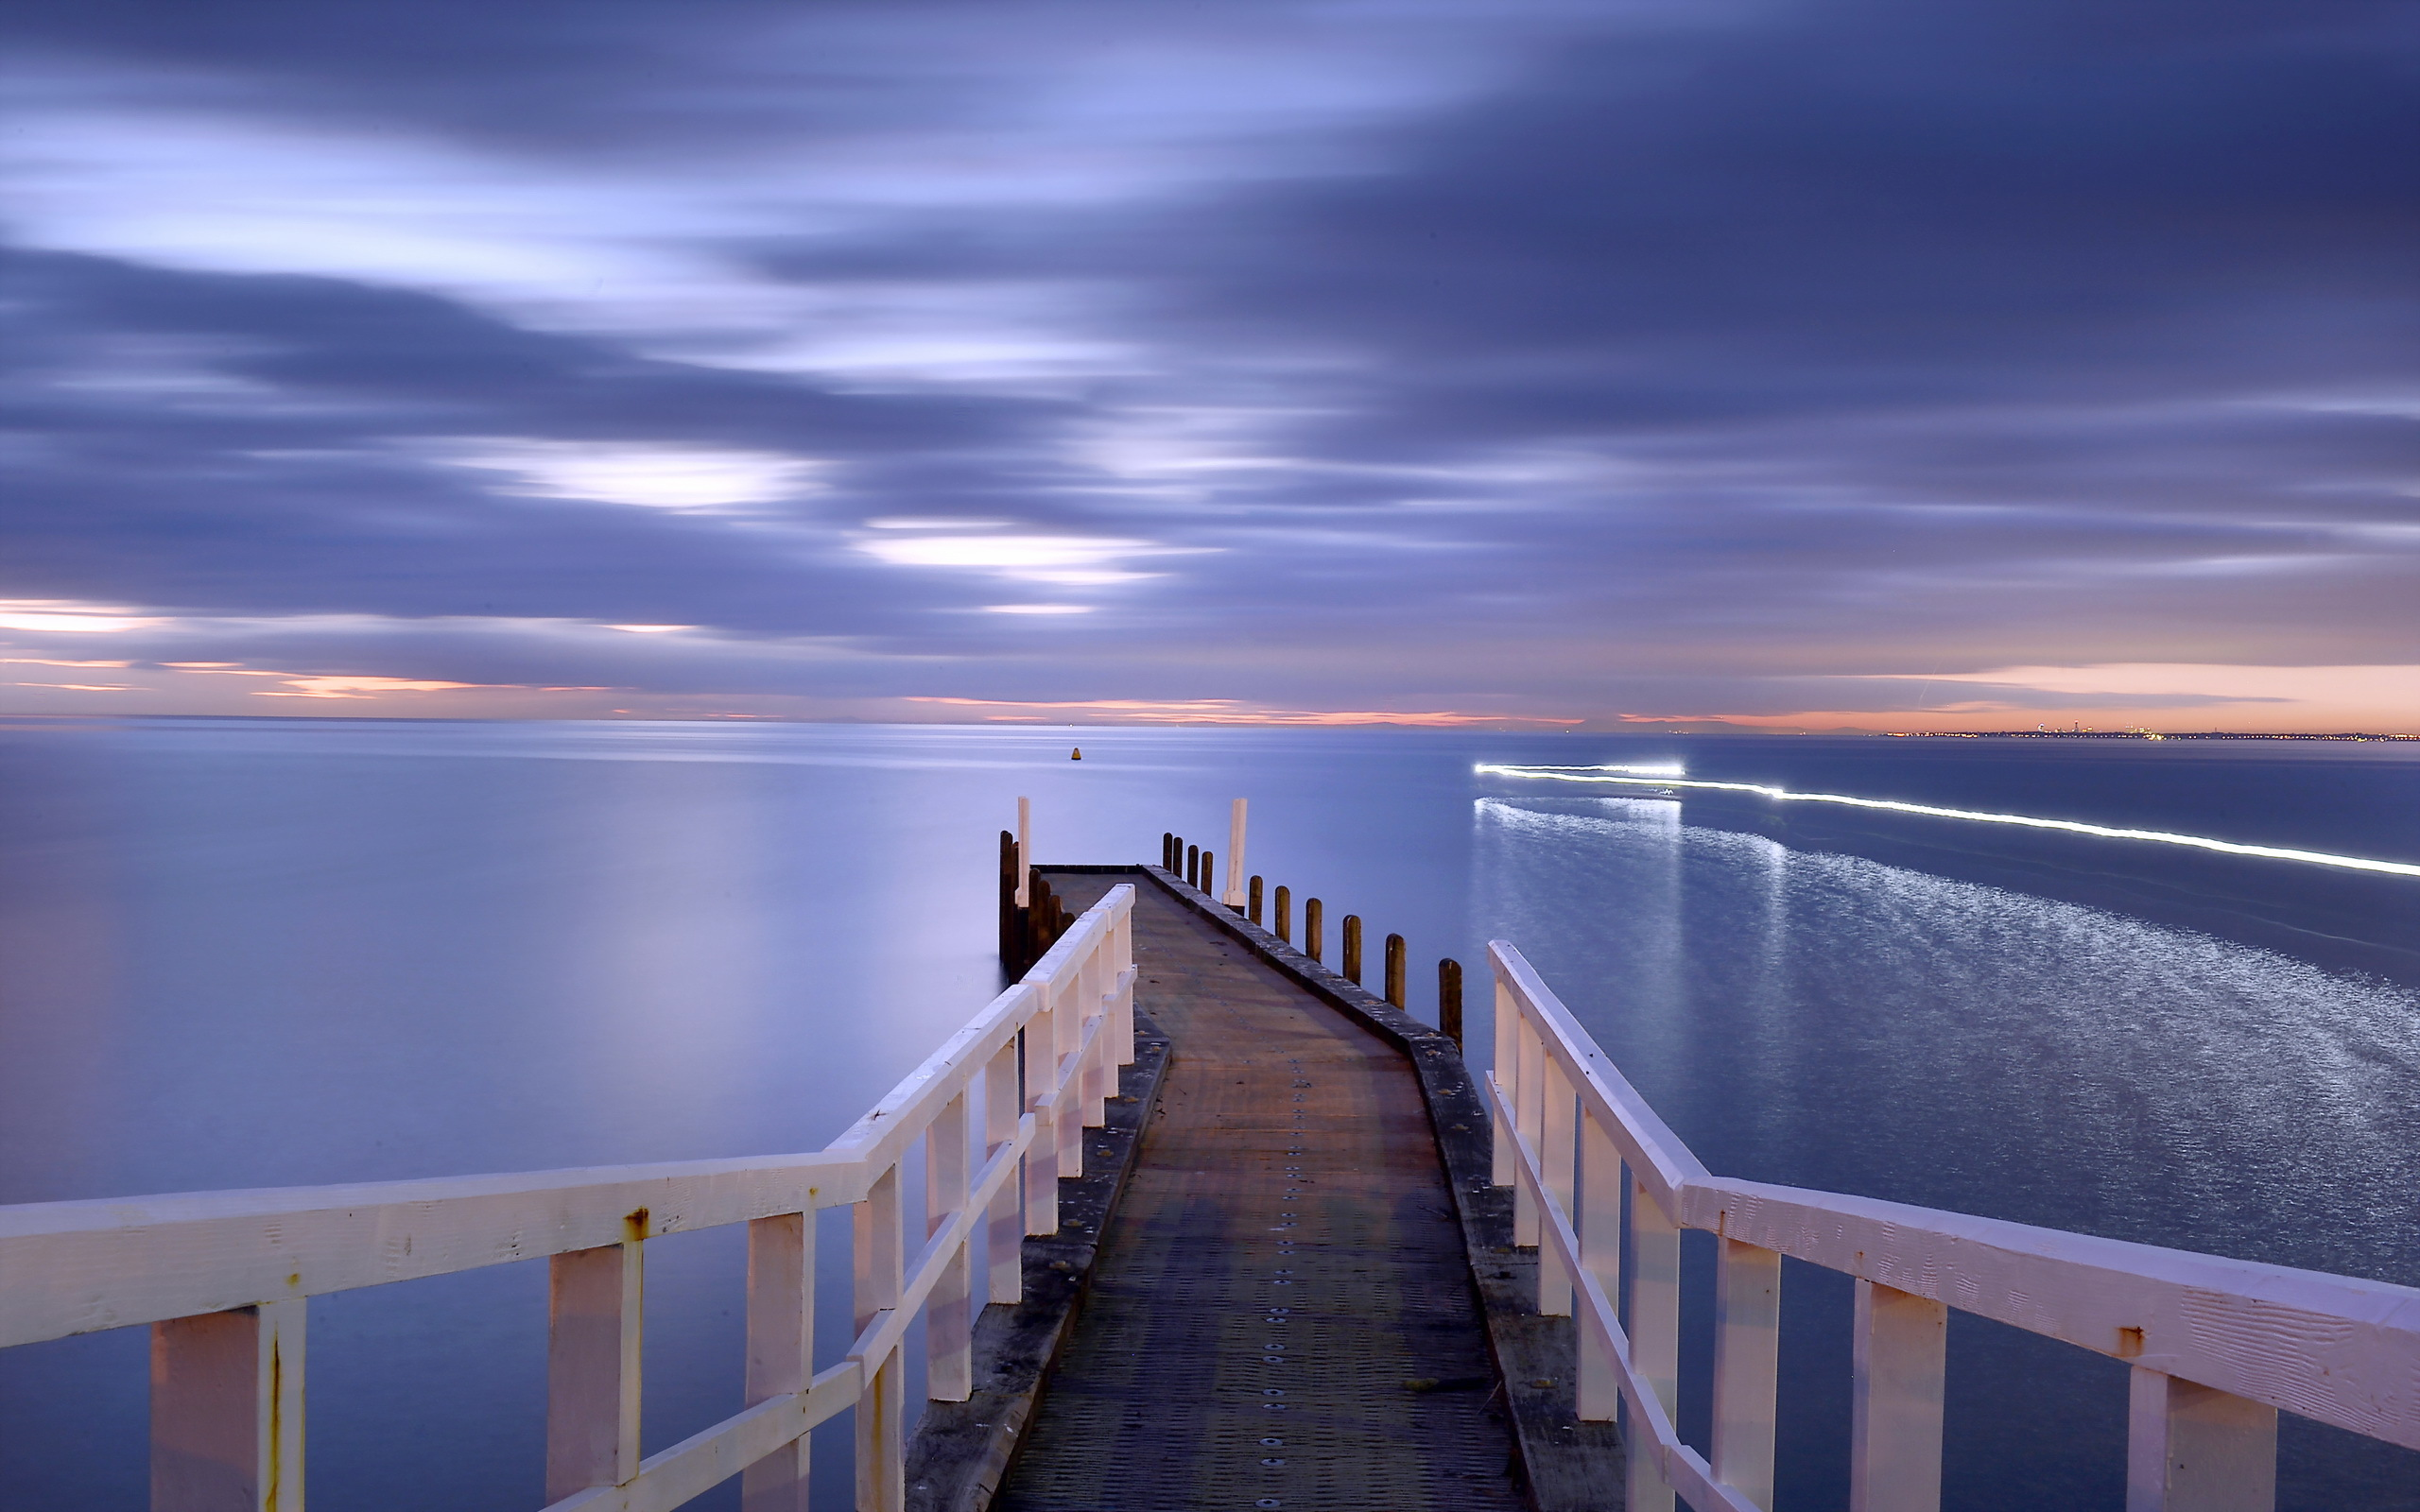 причал фонари берег море pier lights shore sea  № 2555083 загрузить